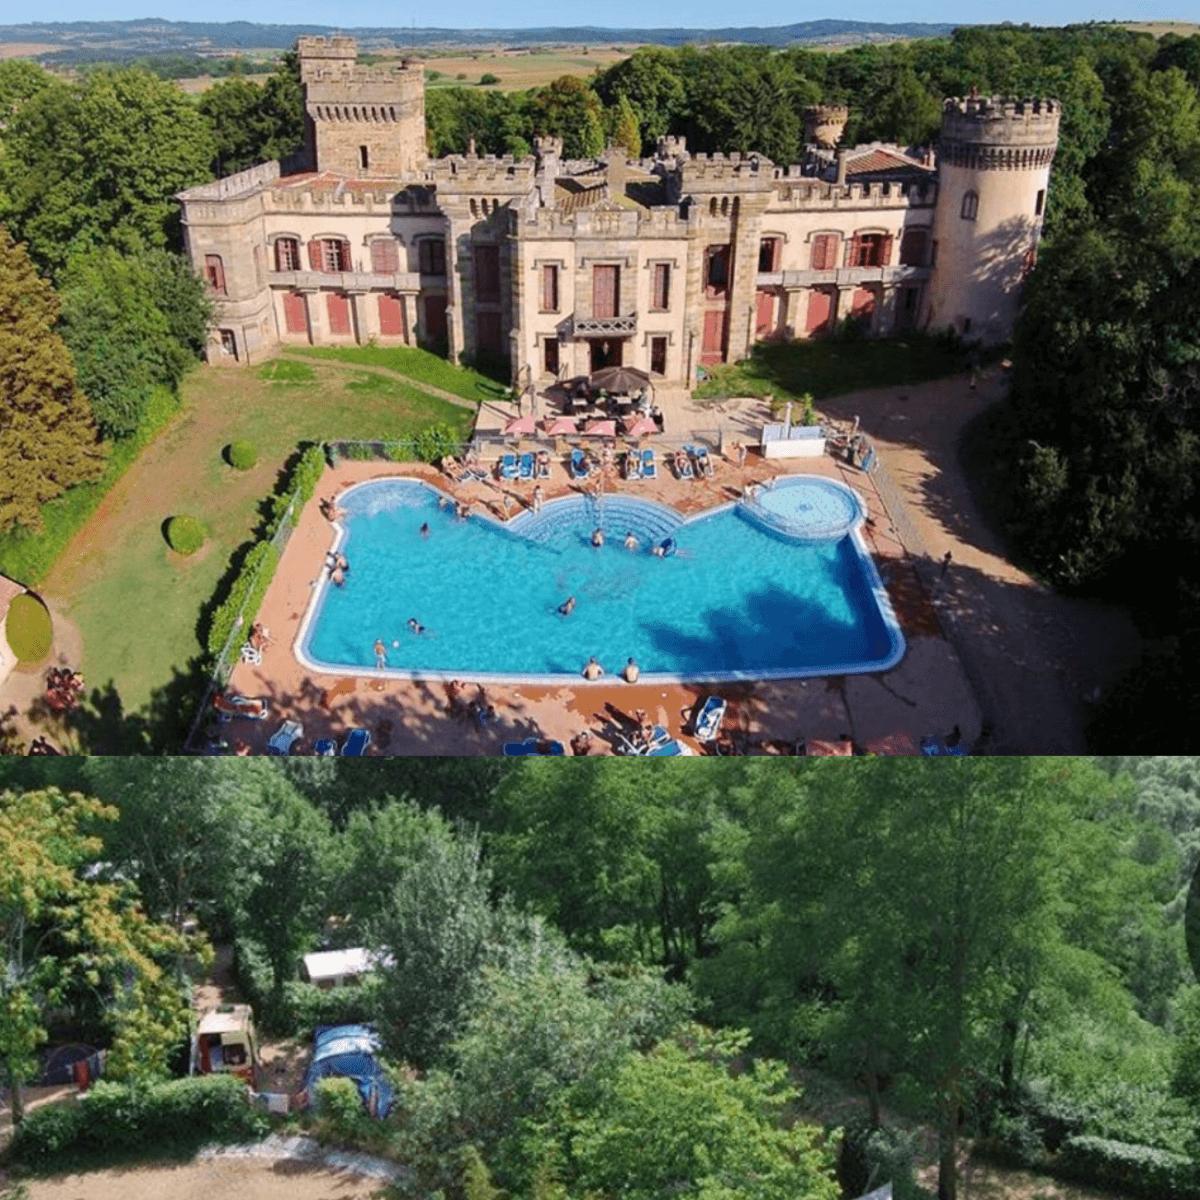 101 leuke idyllische campings in Frankrijk met kids #leukmetkids Camping Château de Grange Fort, Les Pradeaux, Auvergne